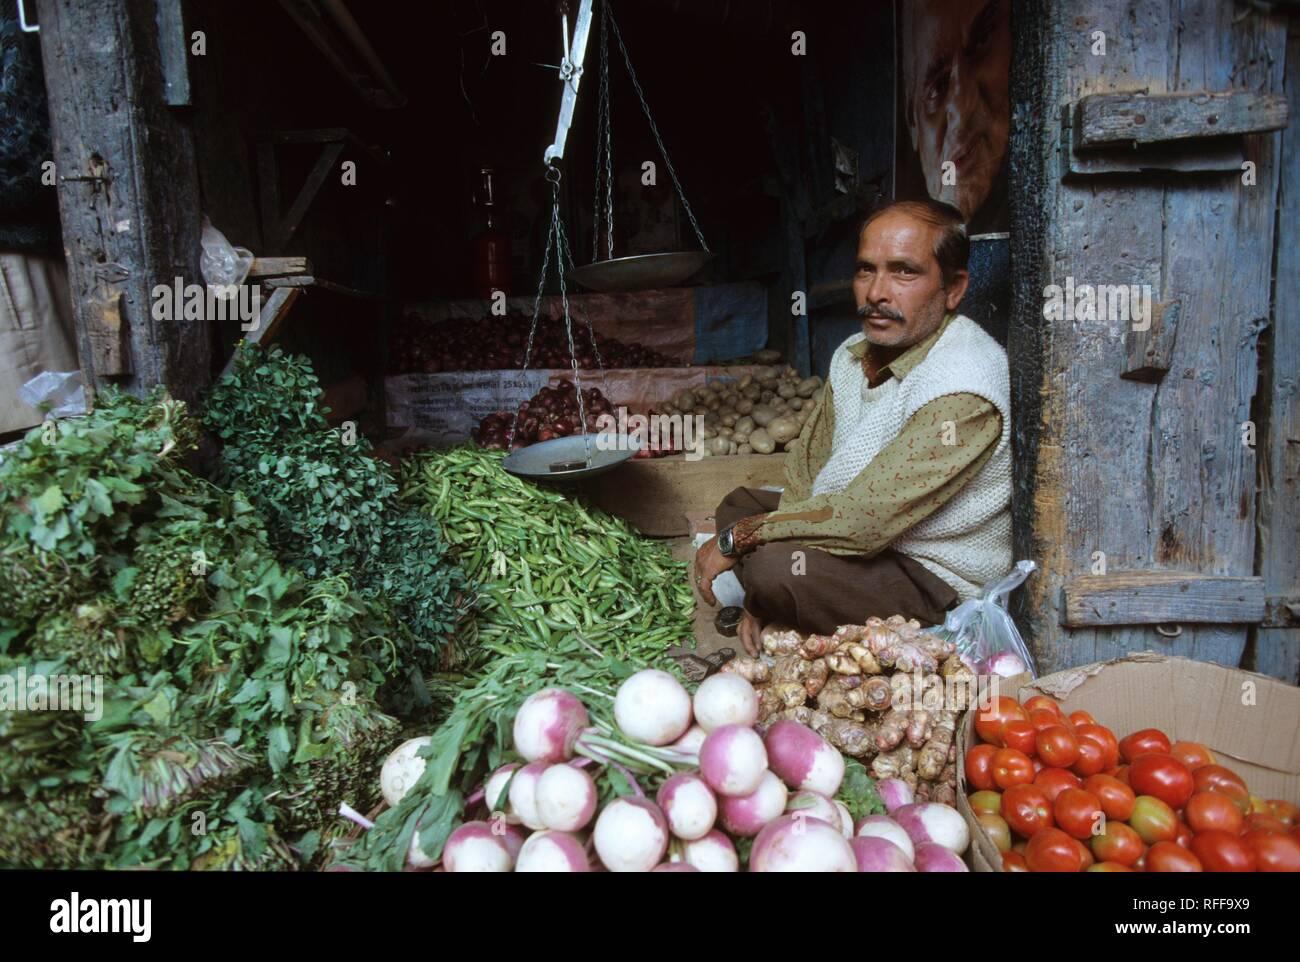 Vegetable market, Shimla, Himachal Pradesh, India - Stock Image